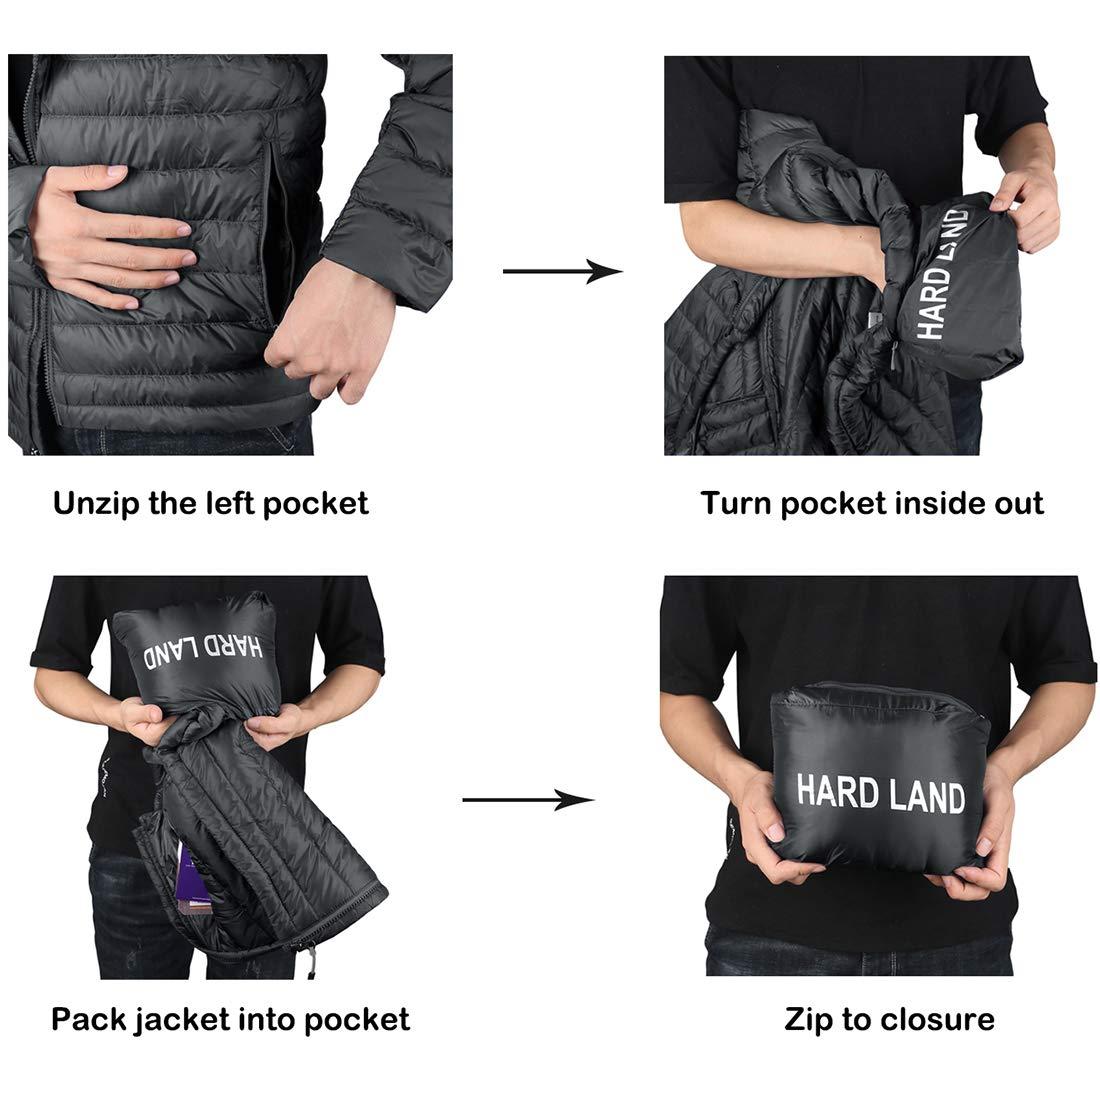 HARD LAND Damen Daunenjacke Warme Ultraleichte Puffer Jacke Wasserabweisend Sport Outdoor